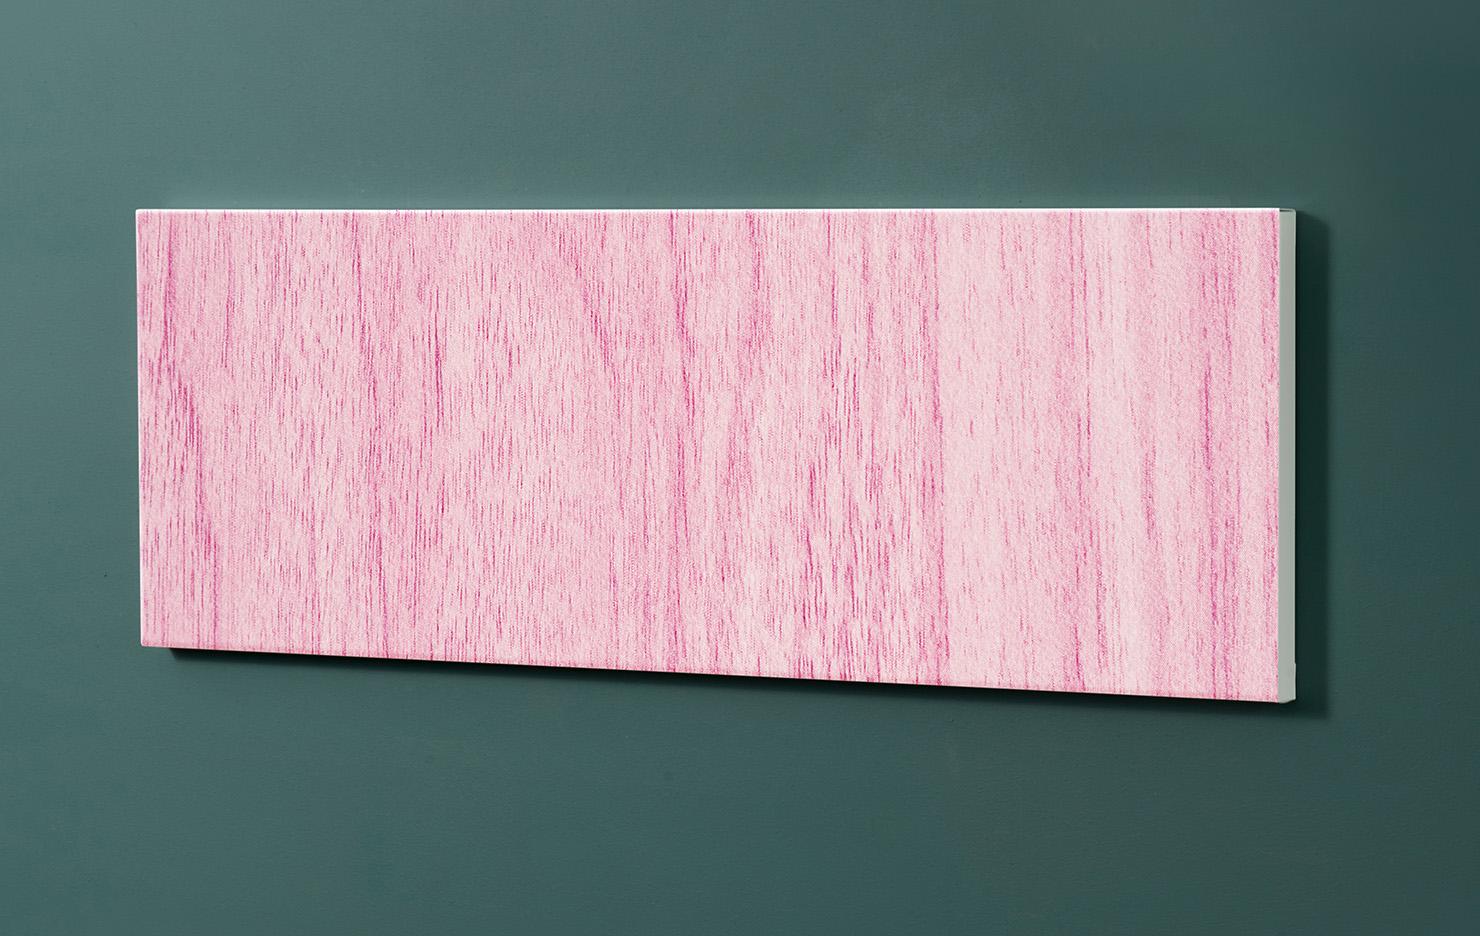 Magnettafel NOTIZ 90x30cm Motiv-Pinnwand M117 Holzbretter Lila